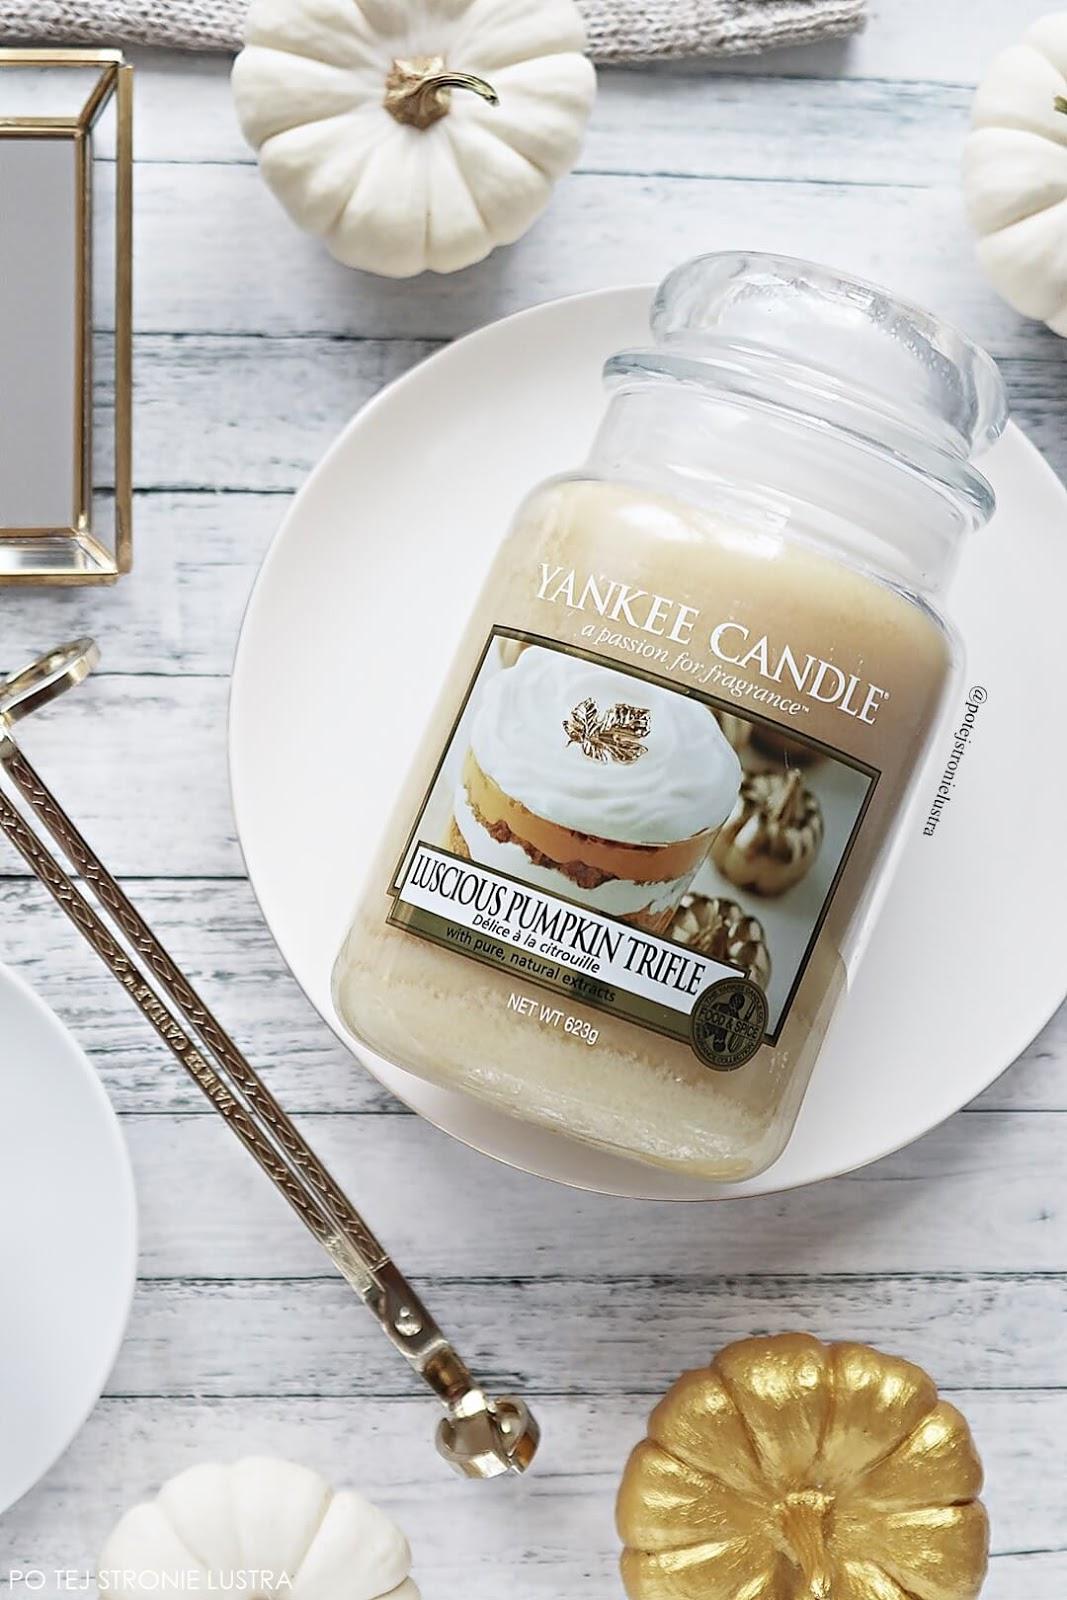 luscious pumpkin trifle yankee candle nowość na jesień 2018